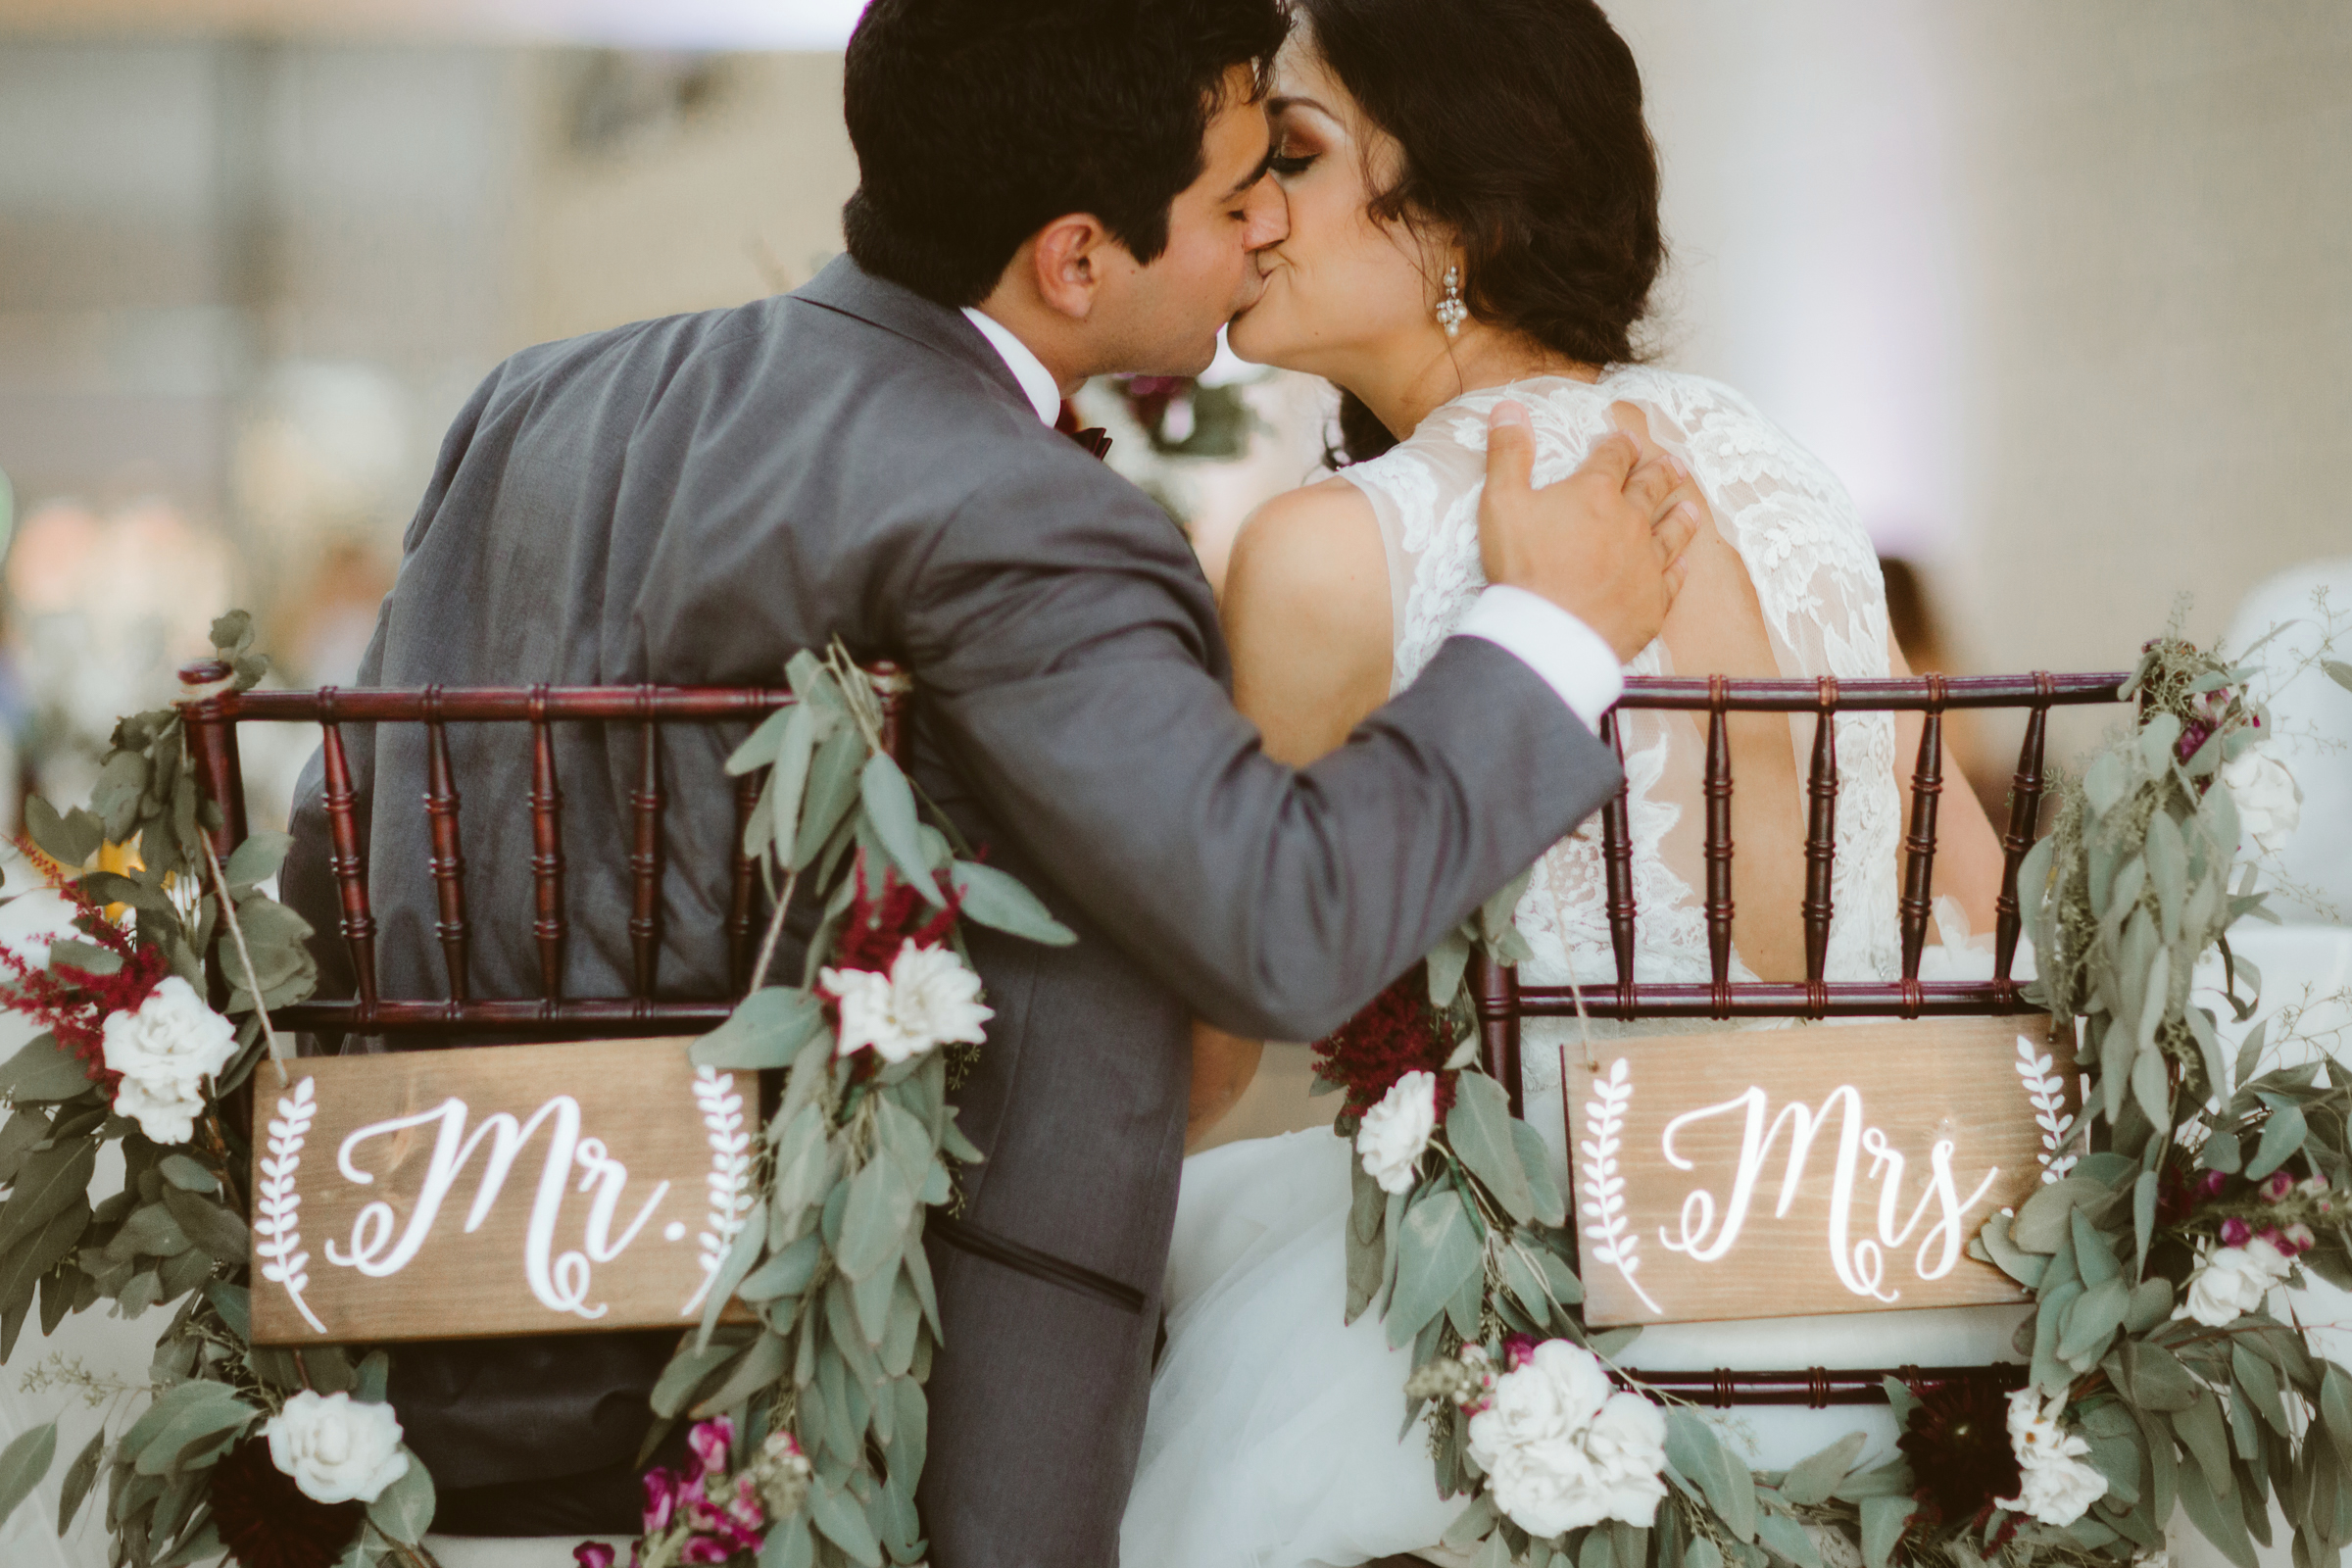 wedding day | MFA St Pete | Vanessa Boy Photography | vanessaboy.com-577.com |final.jpg